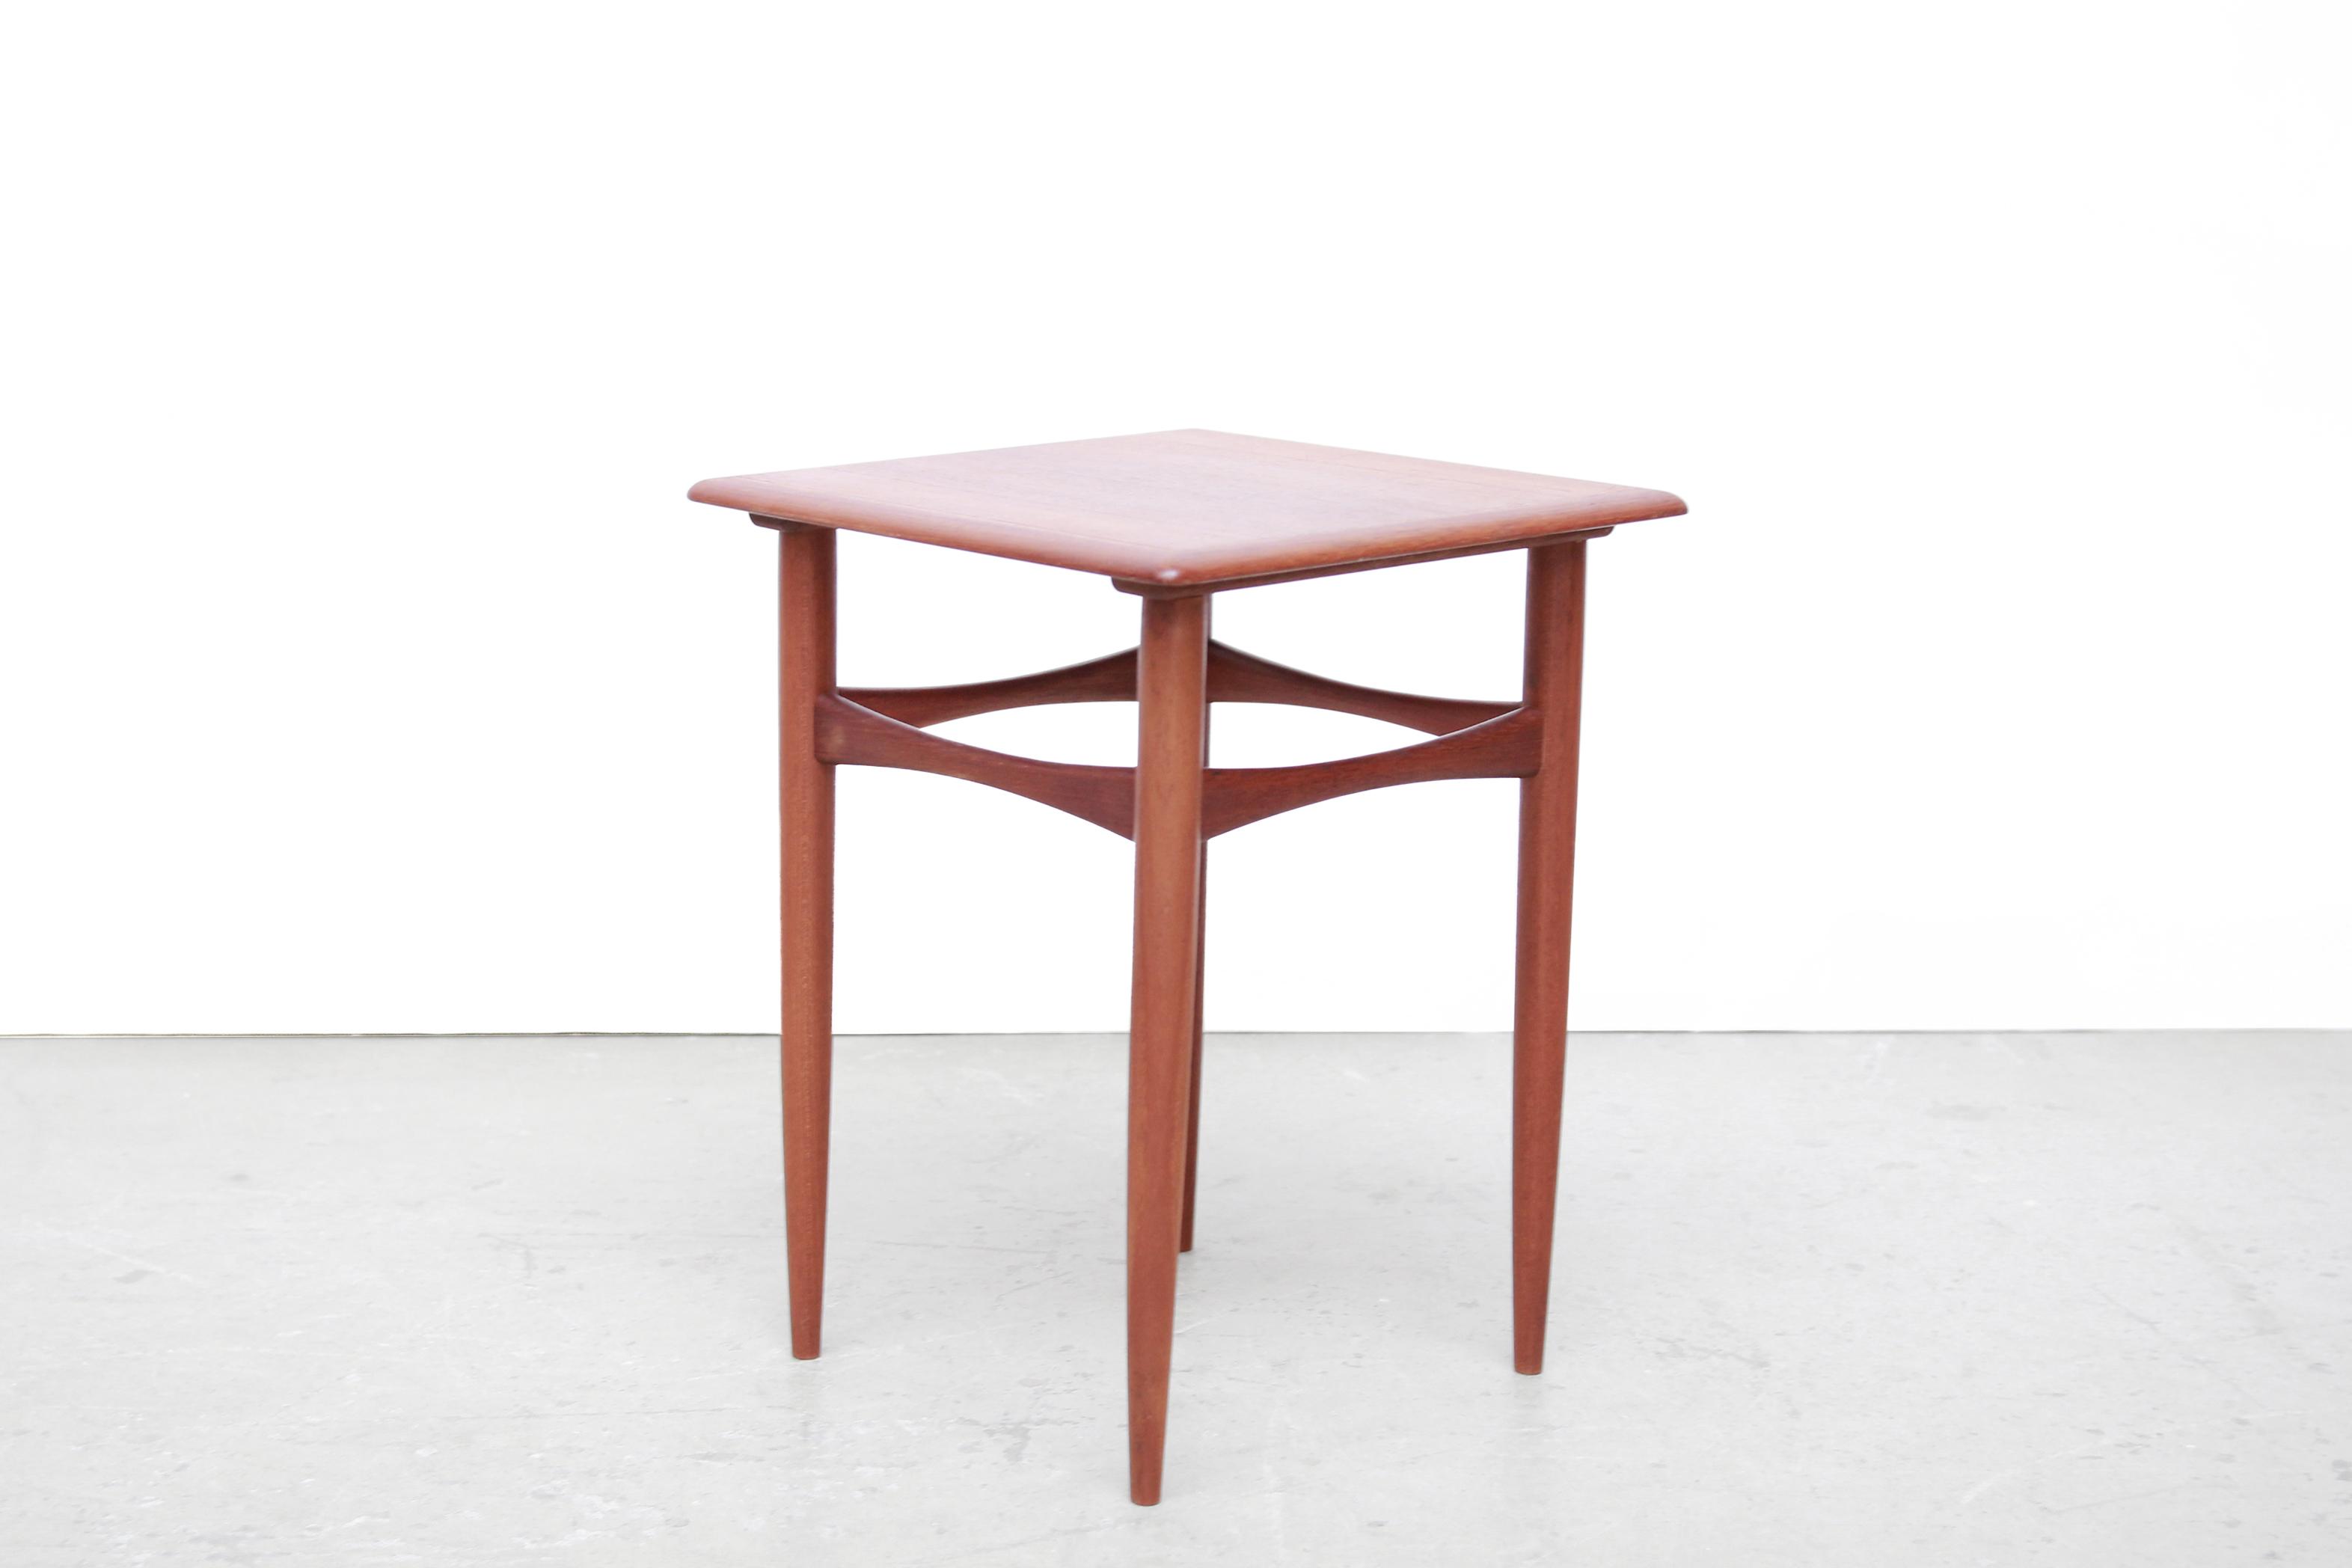 Bijzettafel Modern Design.Hundevad Teakhouten Bijzettafel Teak Side Table Van Ons Mid Century